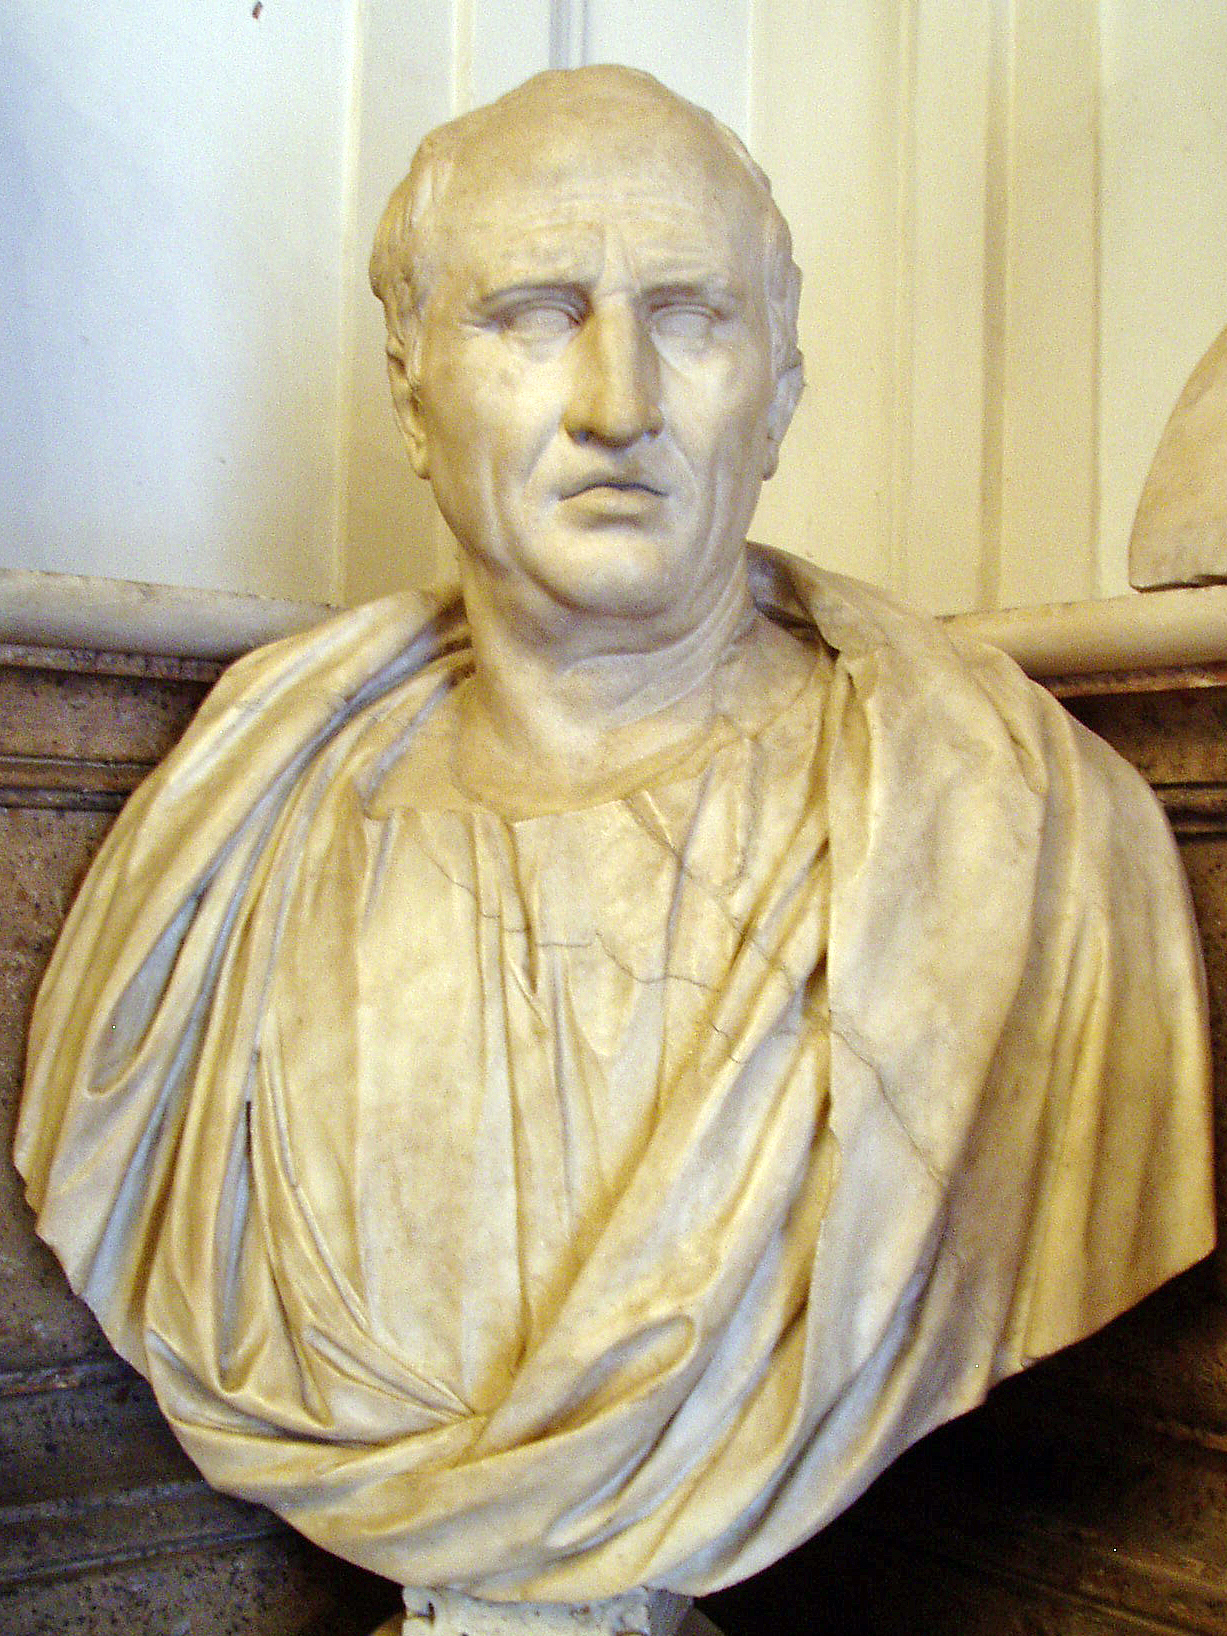 http://upload.wikimedia.org/wikipedia/commons/4/40/Cicero_-_Musei_Capitolini.JPG